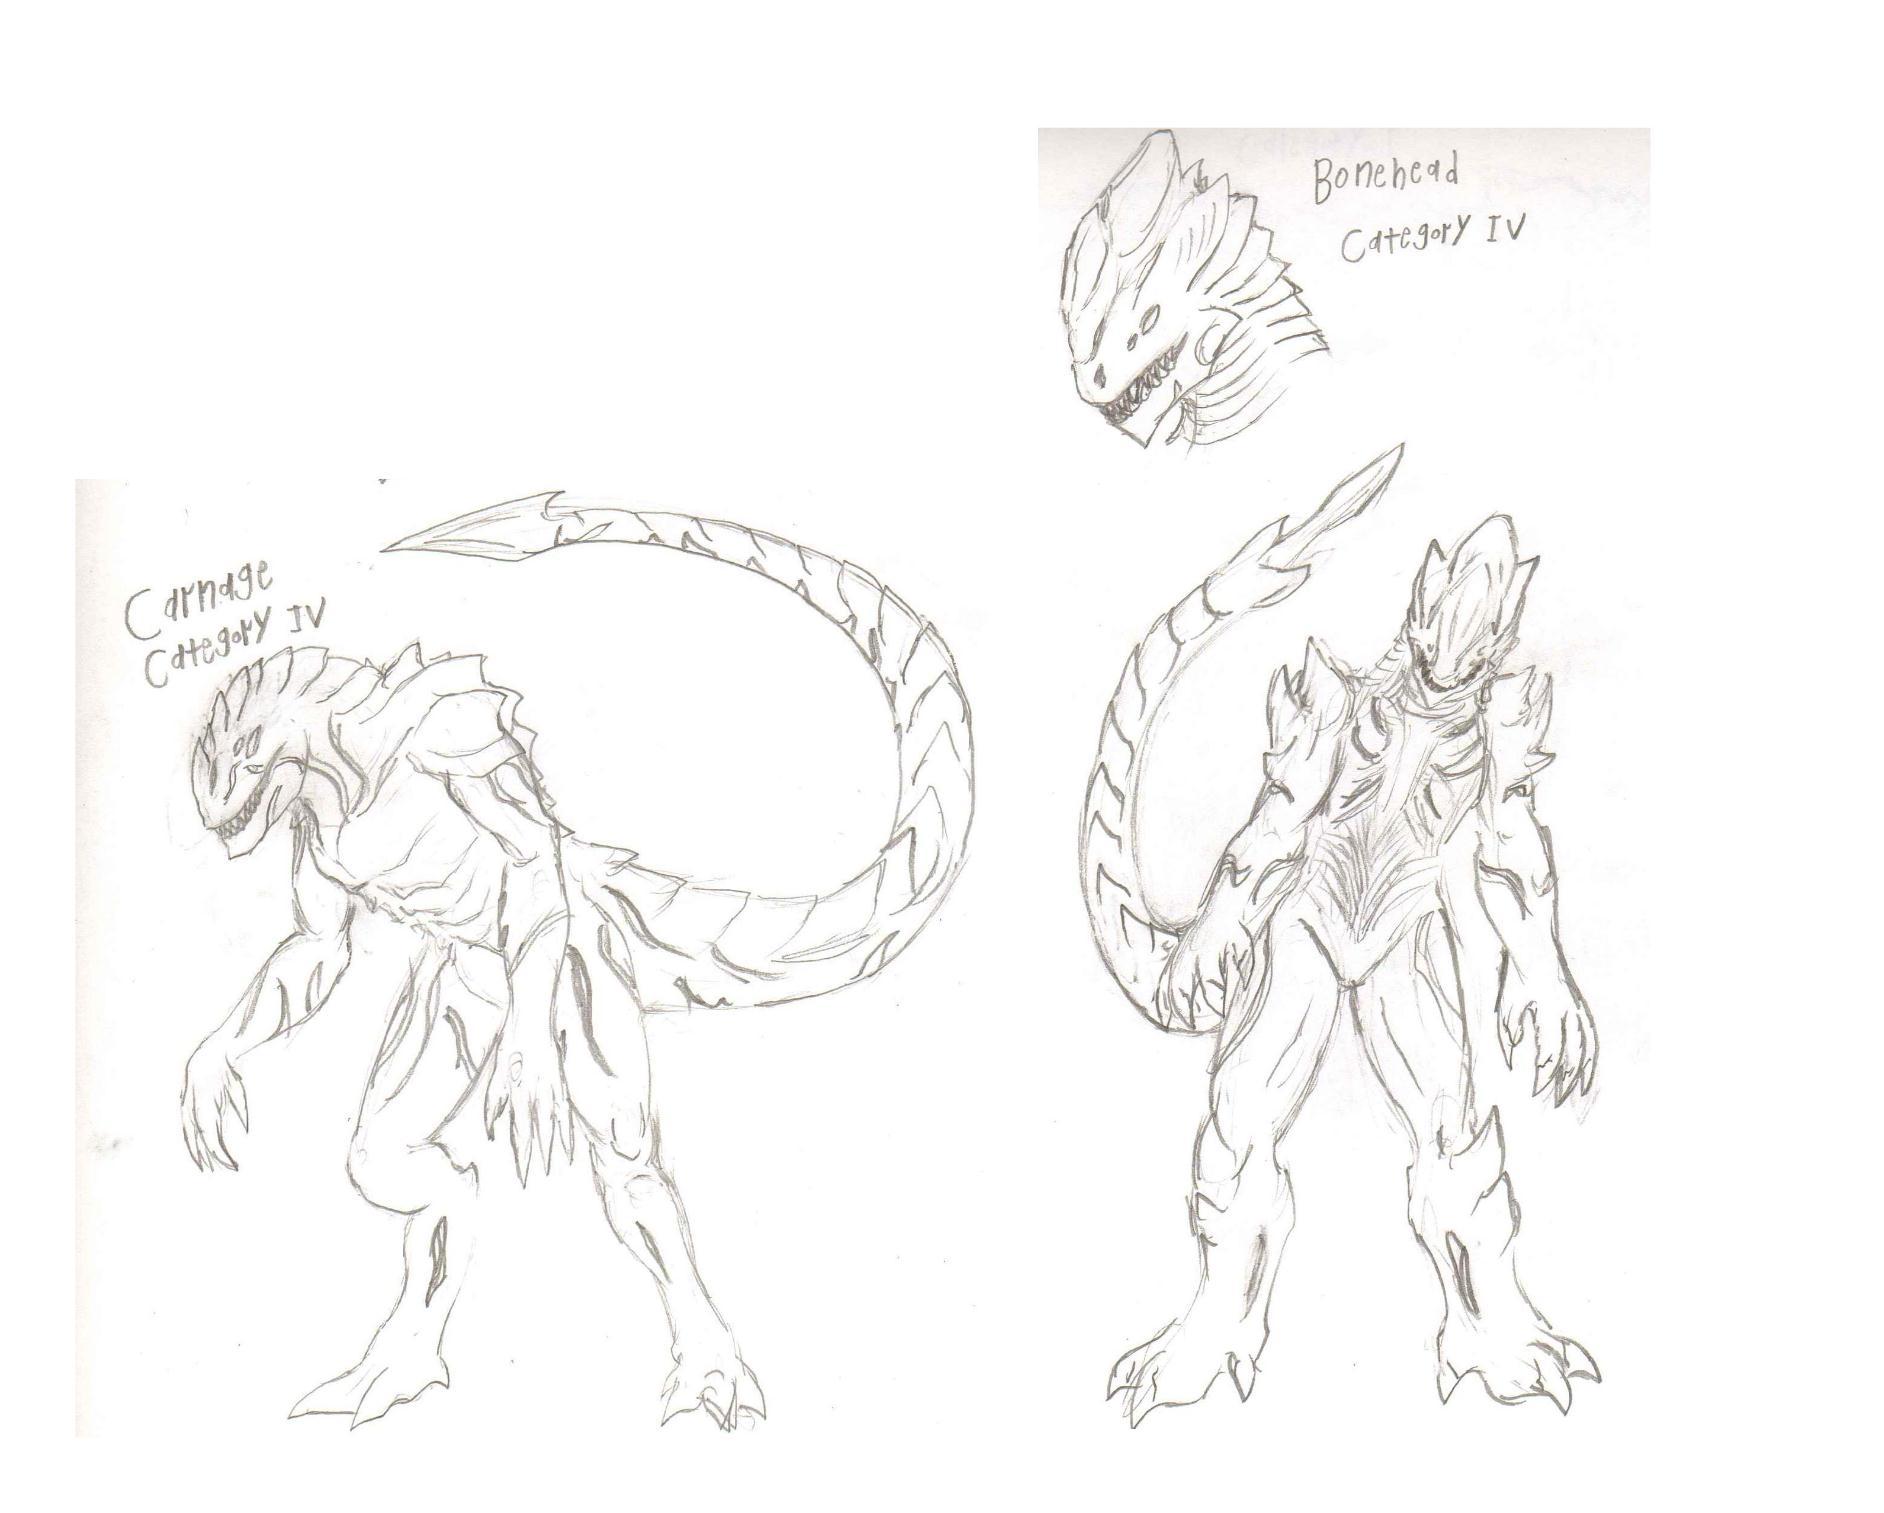 AdventDestiny's Kaiju Fan-Art Gallery Pr_carnage_sketches_by_adventdestiny-d6tswal